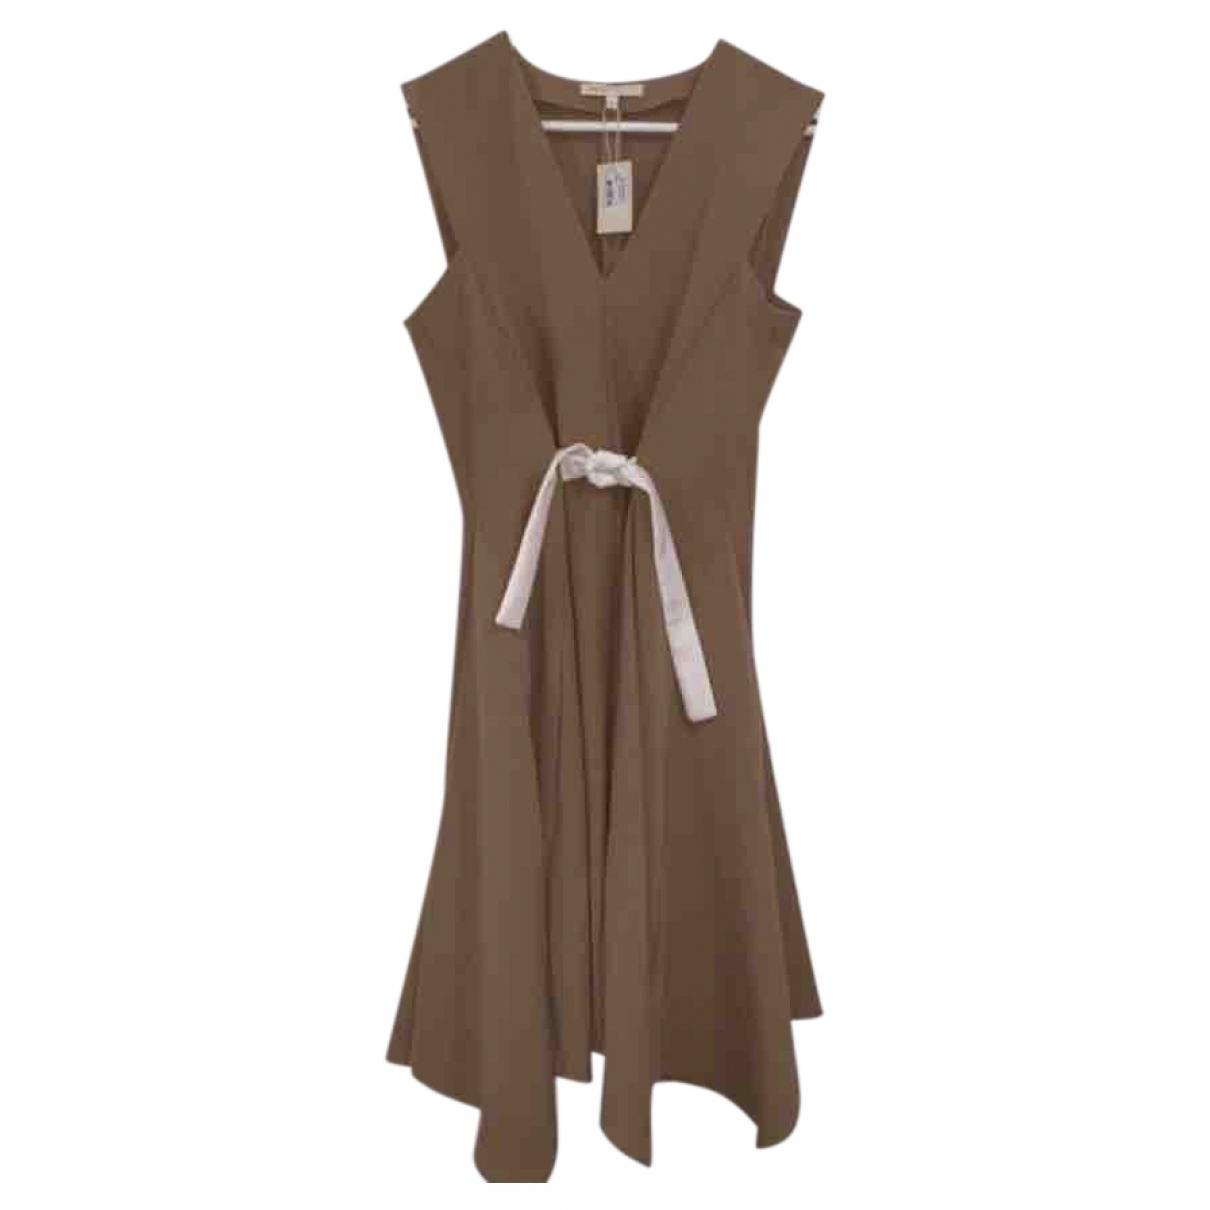 Maje \N Camel Cotton dress for Women 40 FR